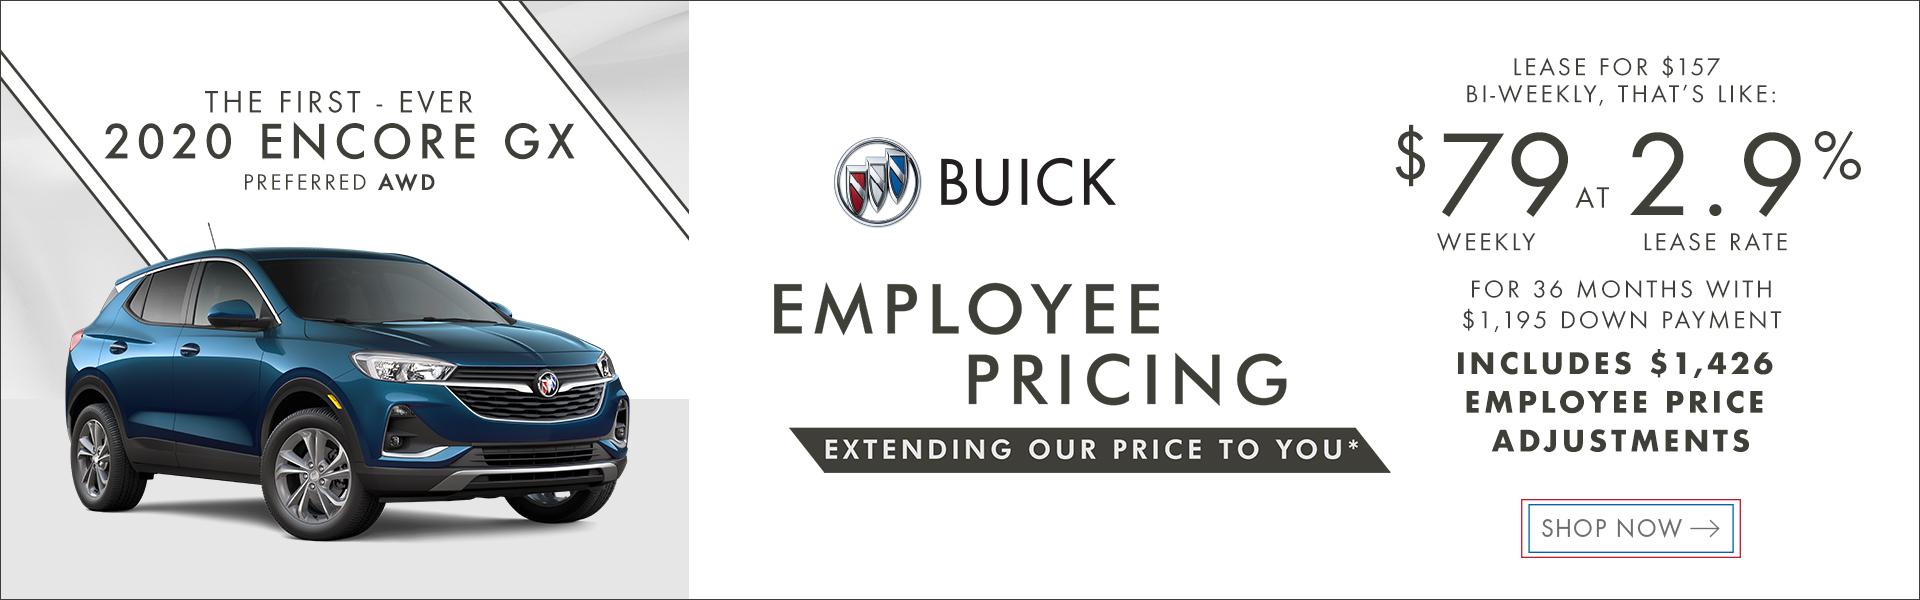 GMCCA - Western - Buick Encore GX